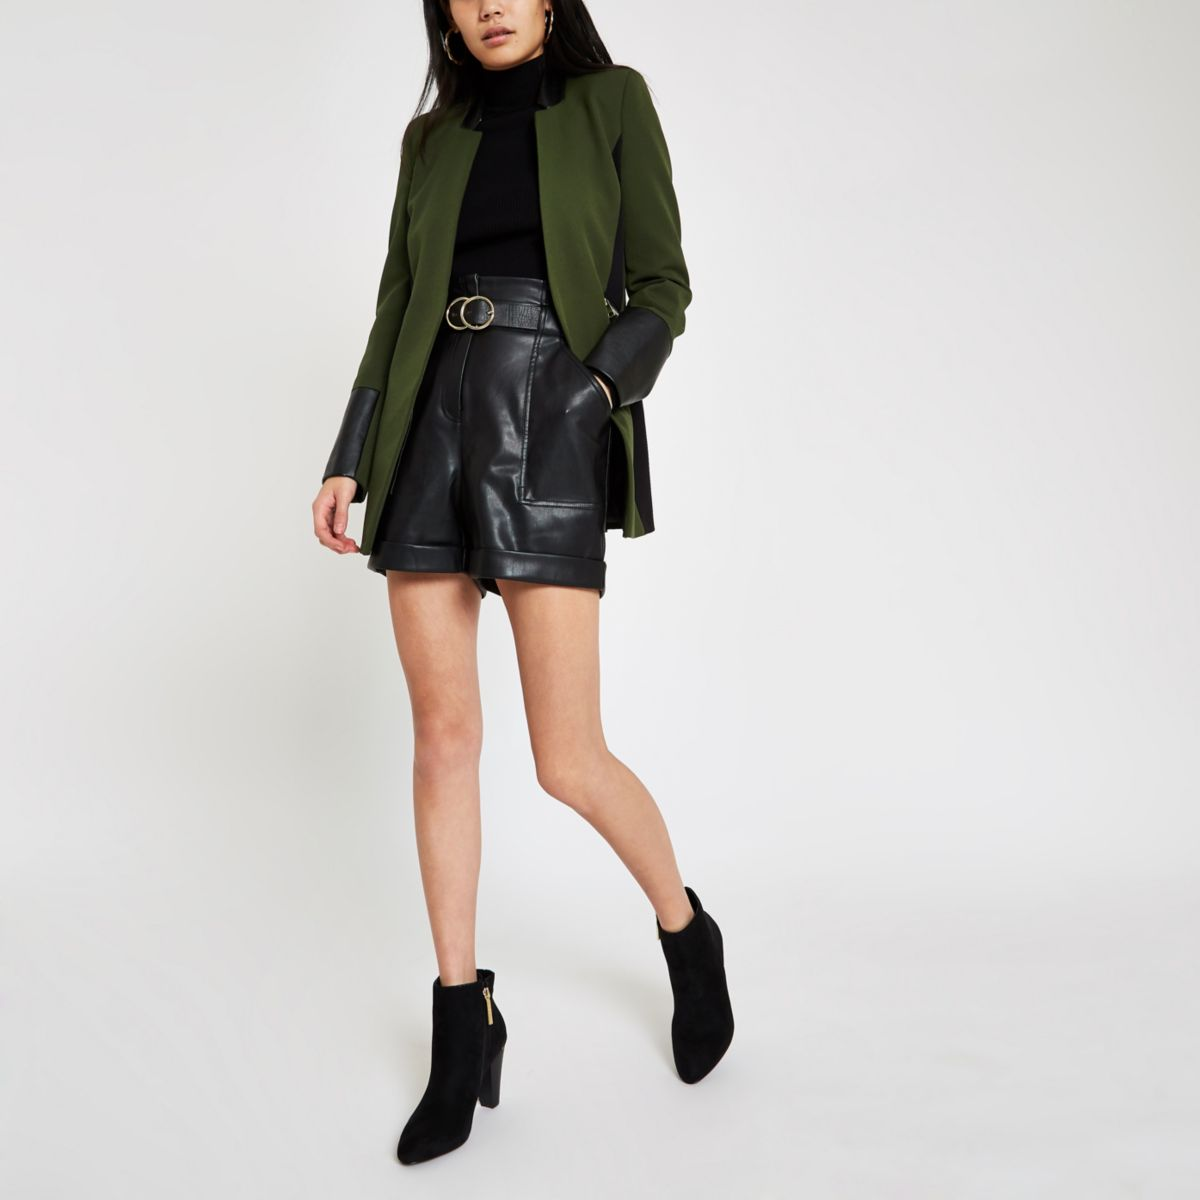 Khaki green faux leather trim blazer